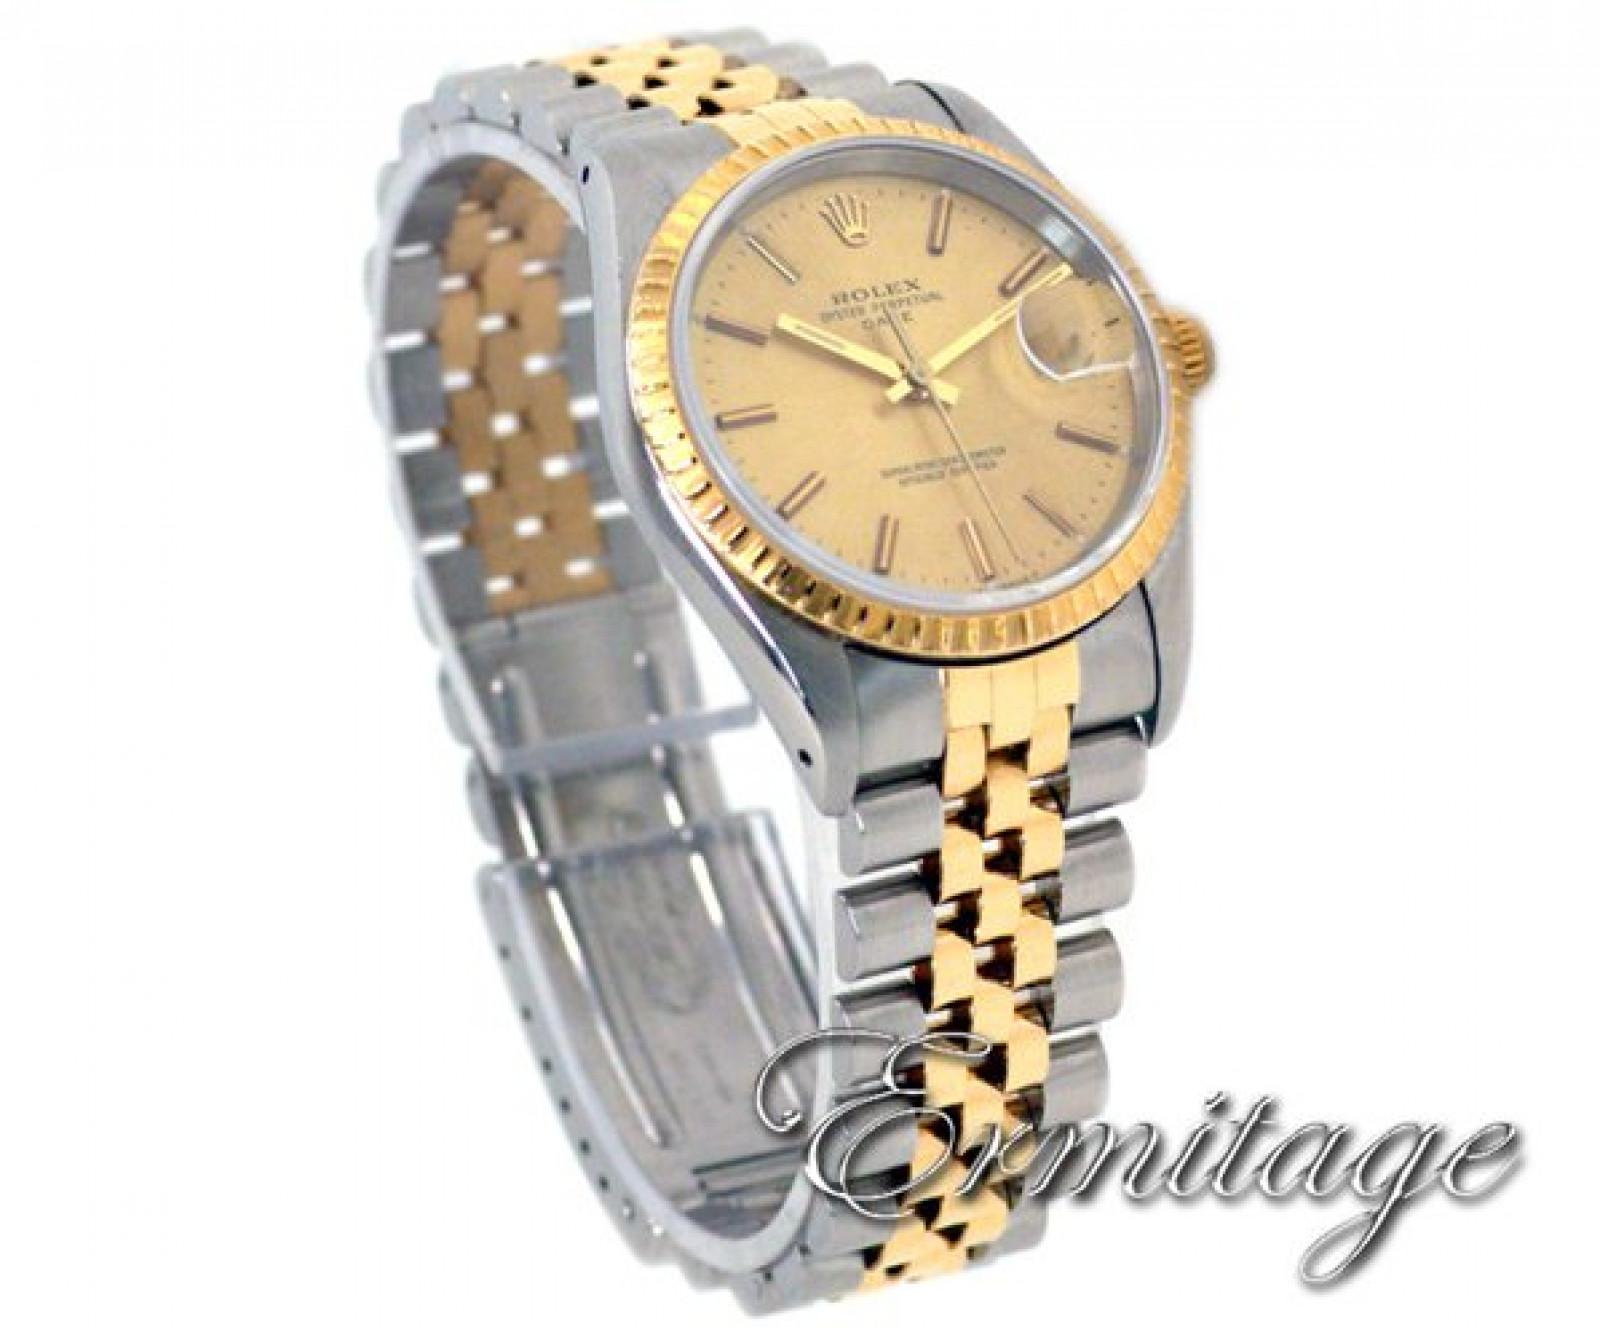 Rolex Date 15233 Gold & Steel Champagne 1990